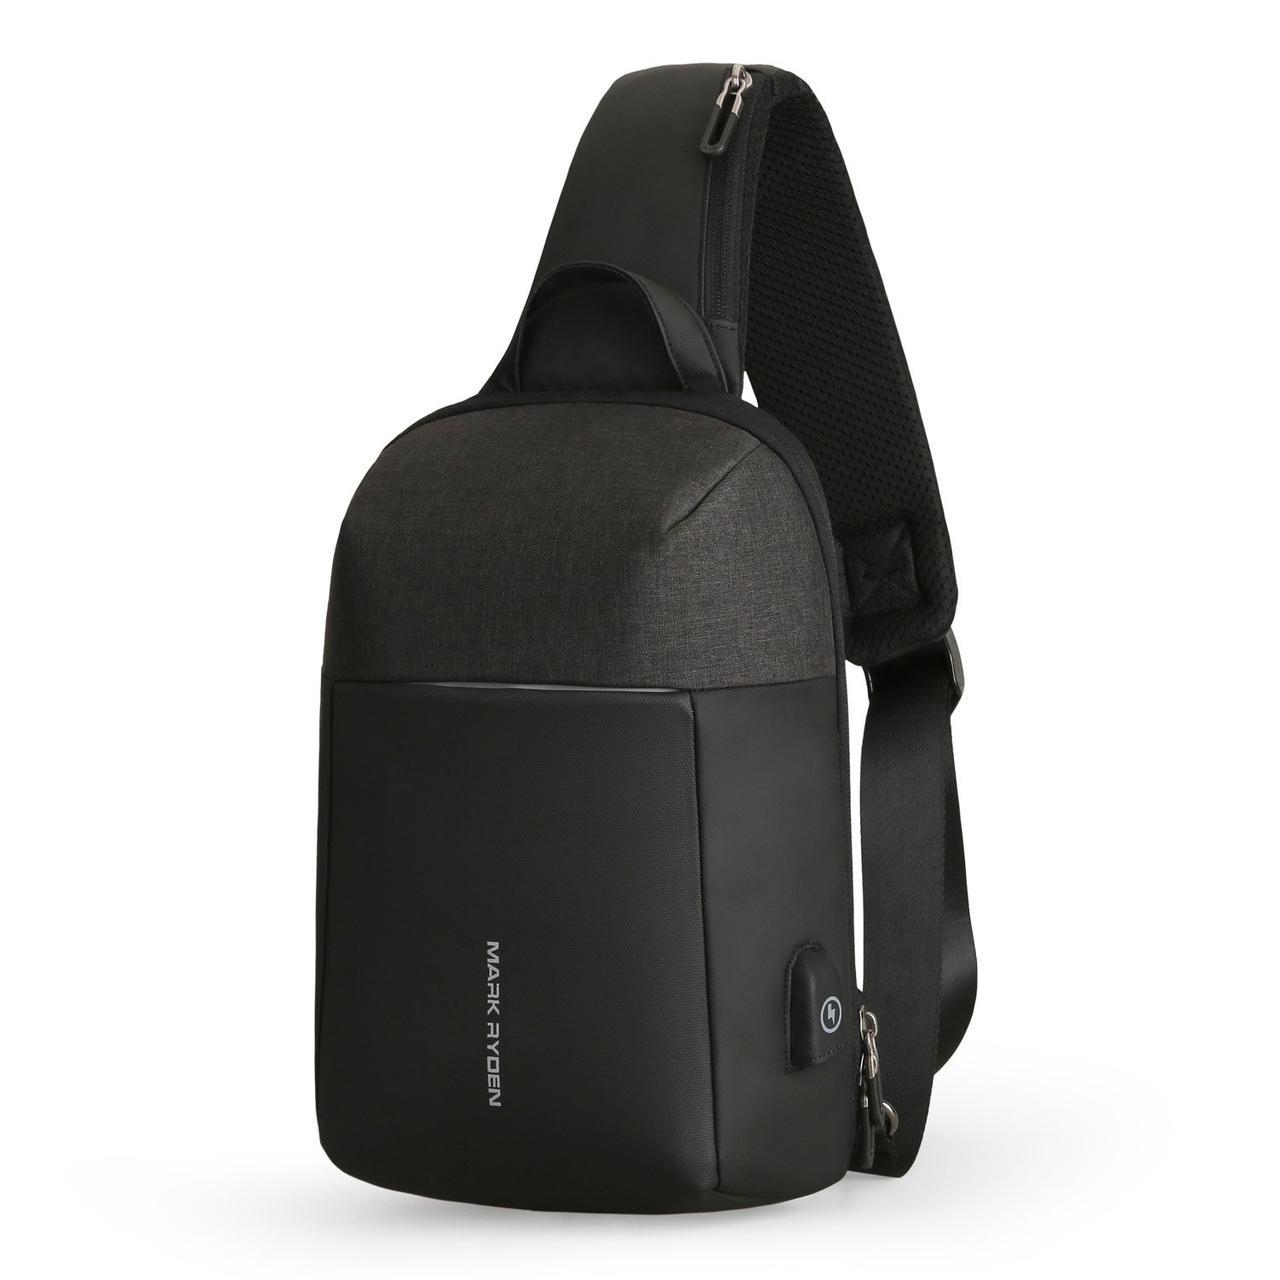 Рюкзак с одной лямкой Mark Ryden MiniPanzer MR7000 Black